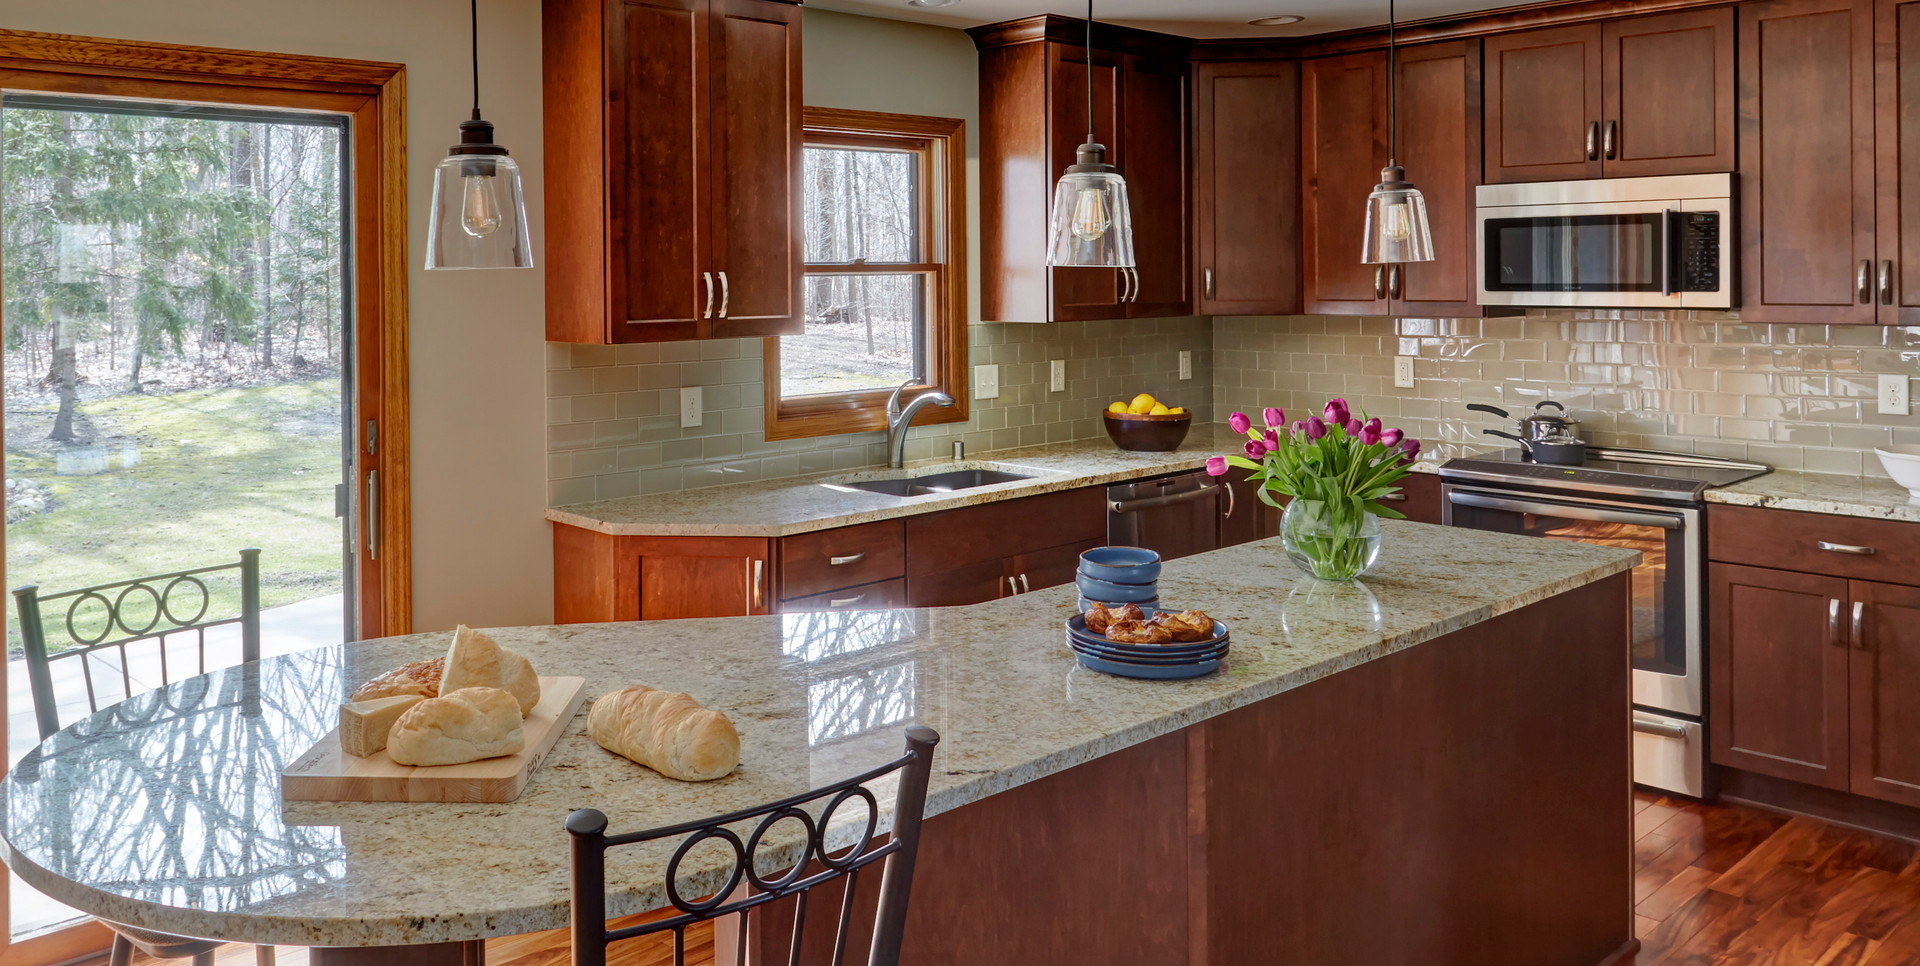 West Bend Transitional Kitchen - After